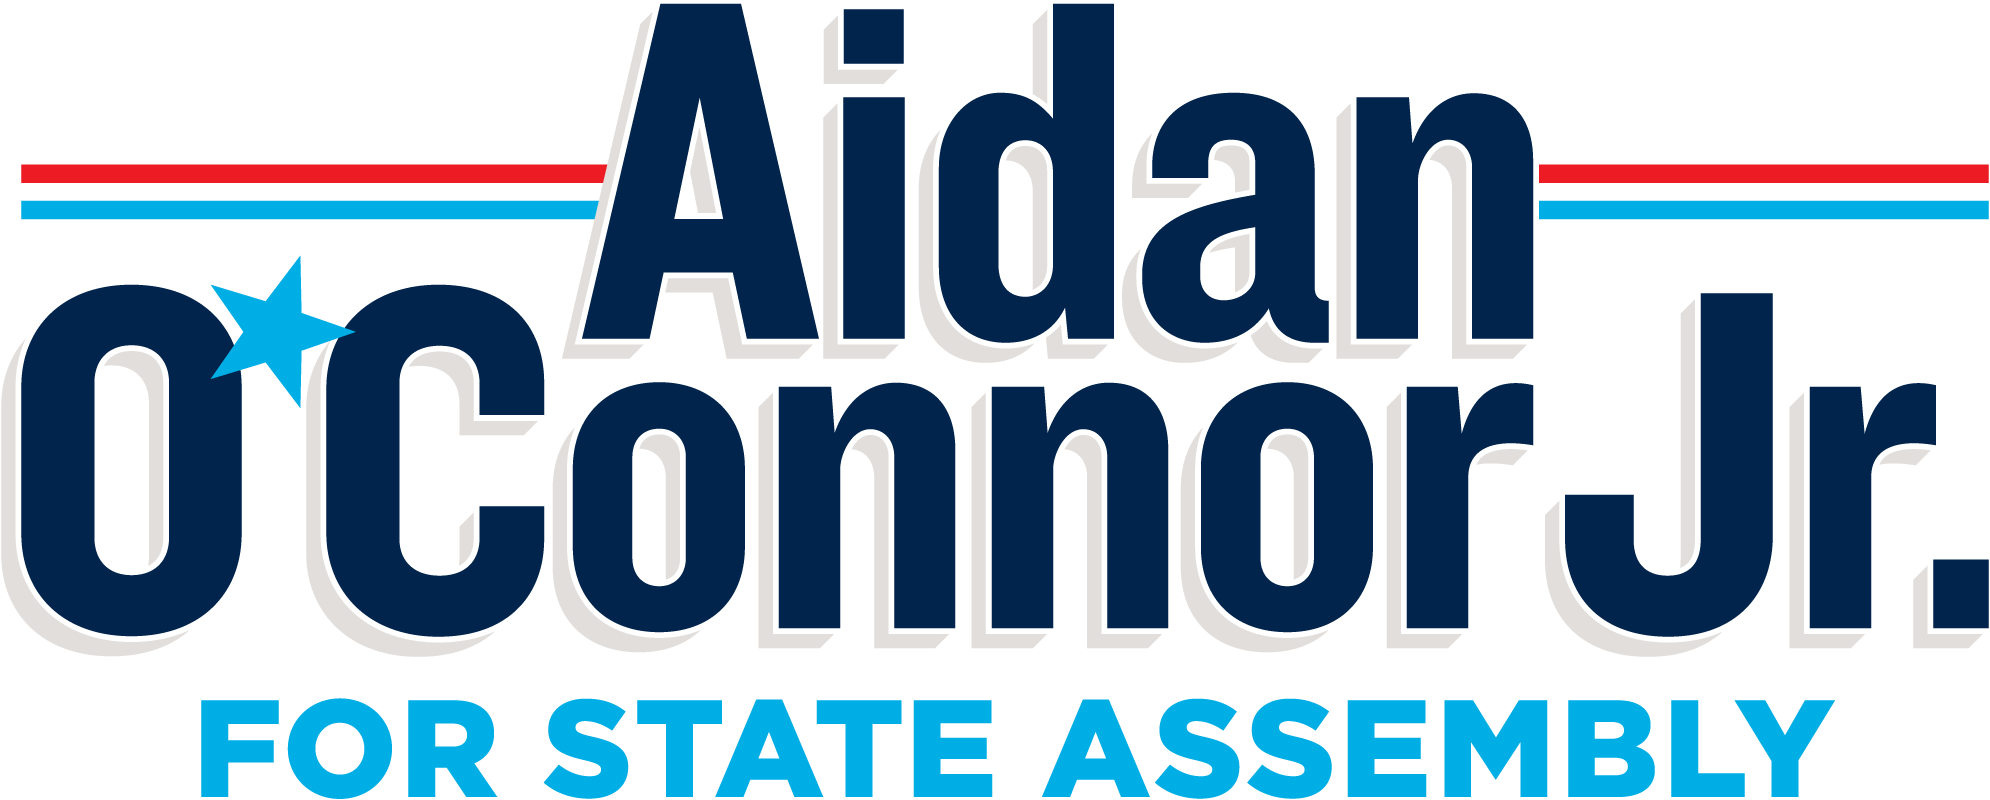 Oconnor2018-ad102-logo-primary